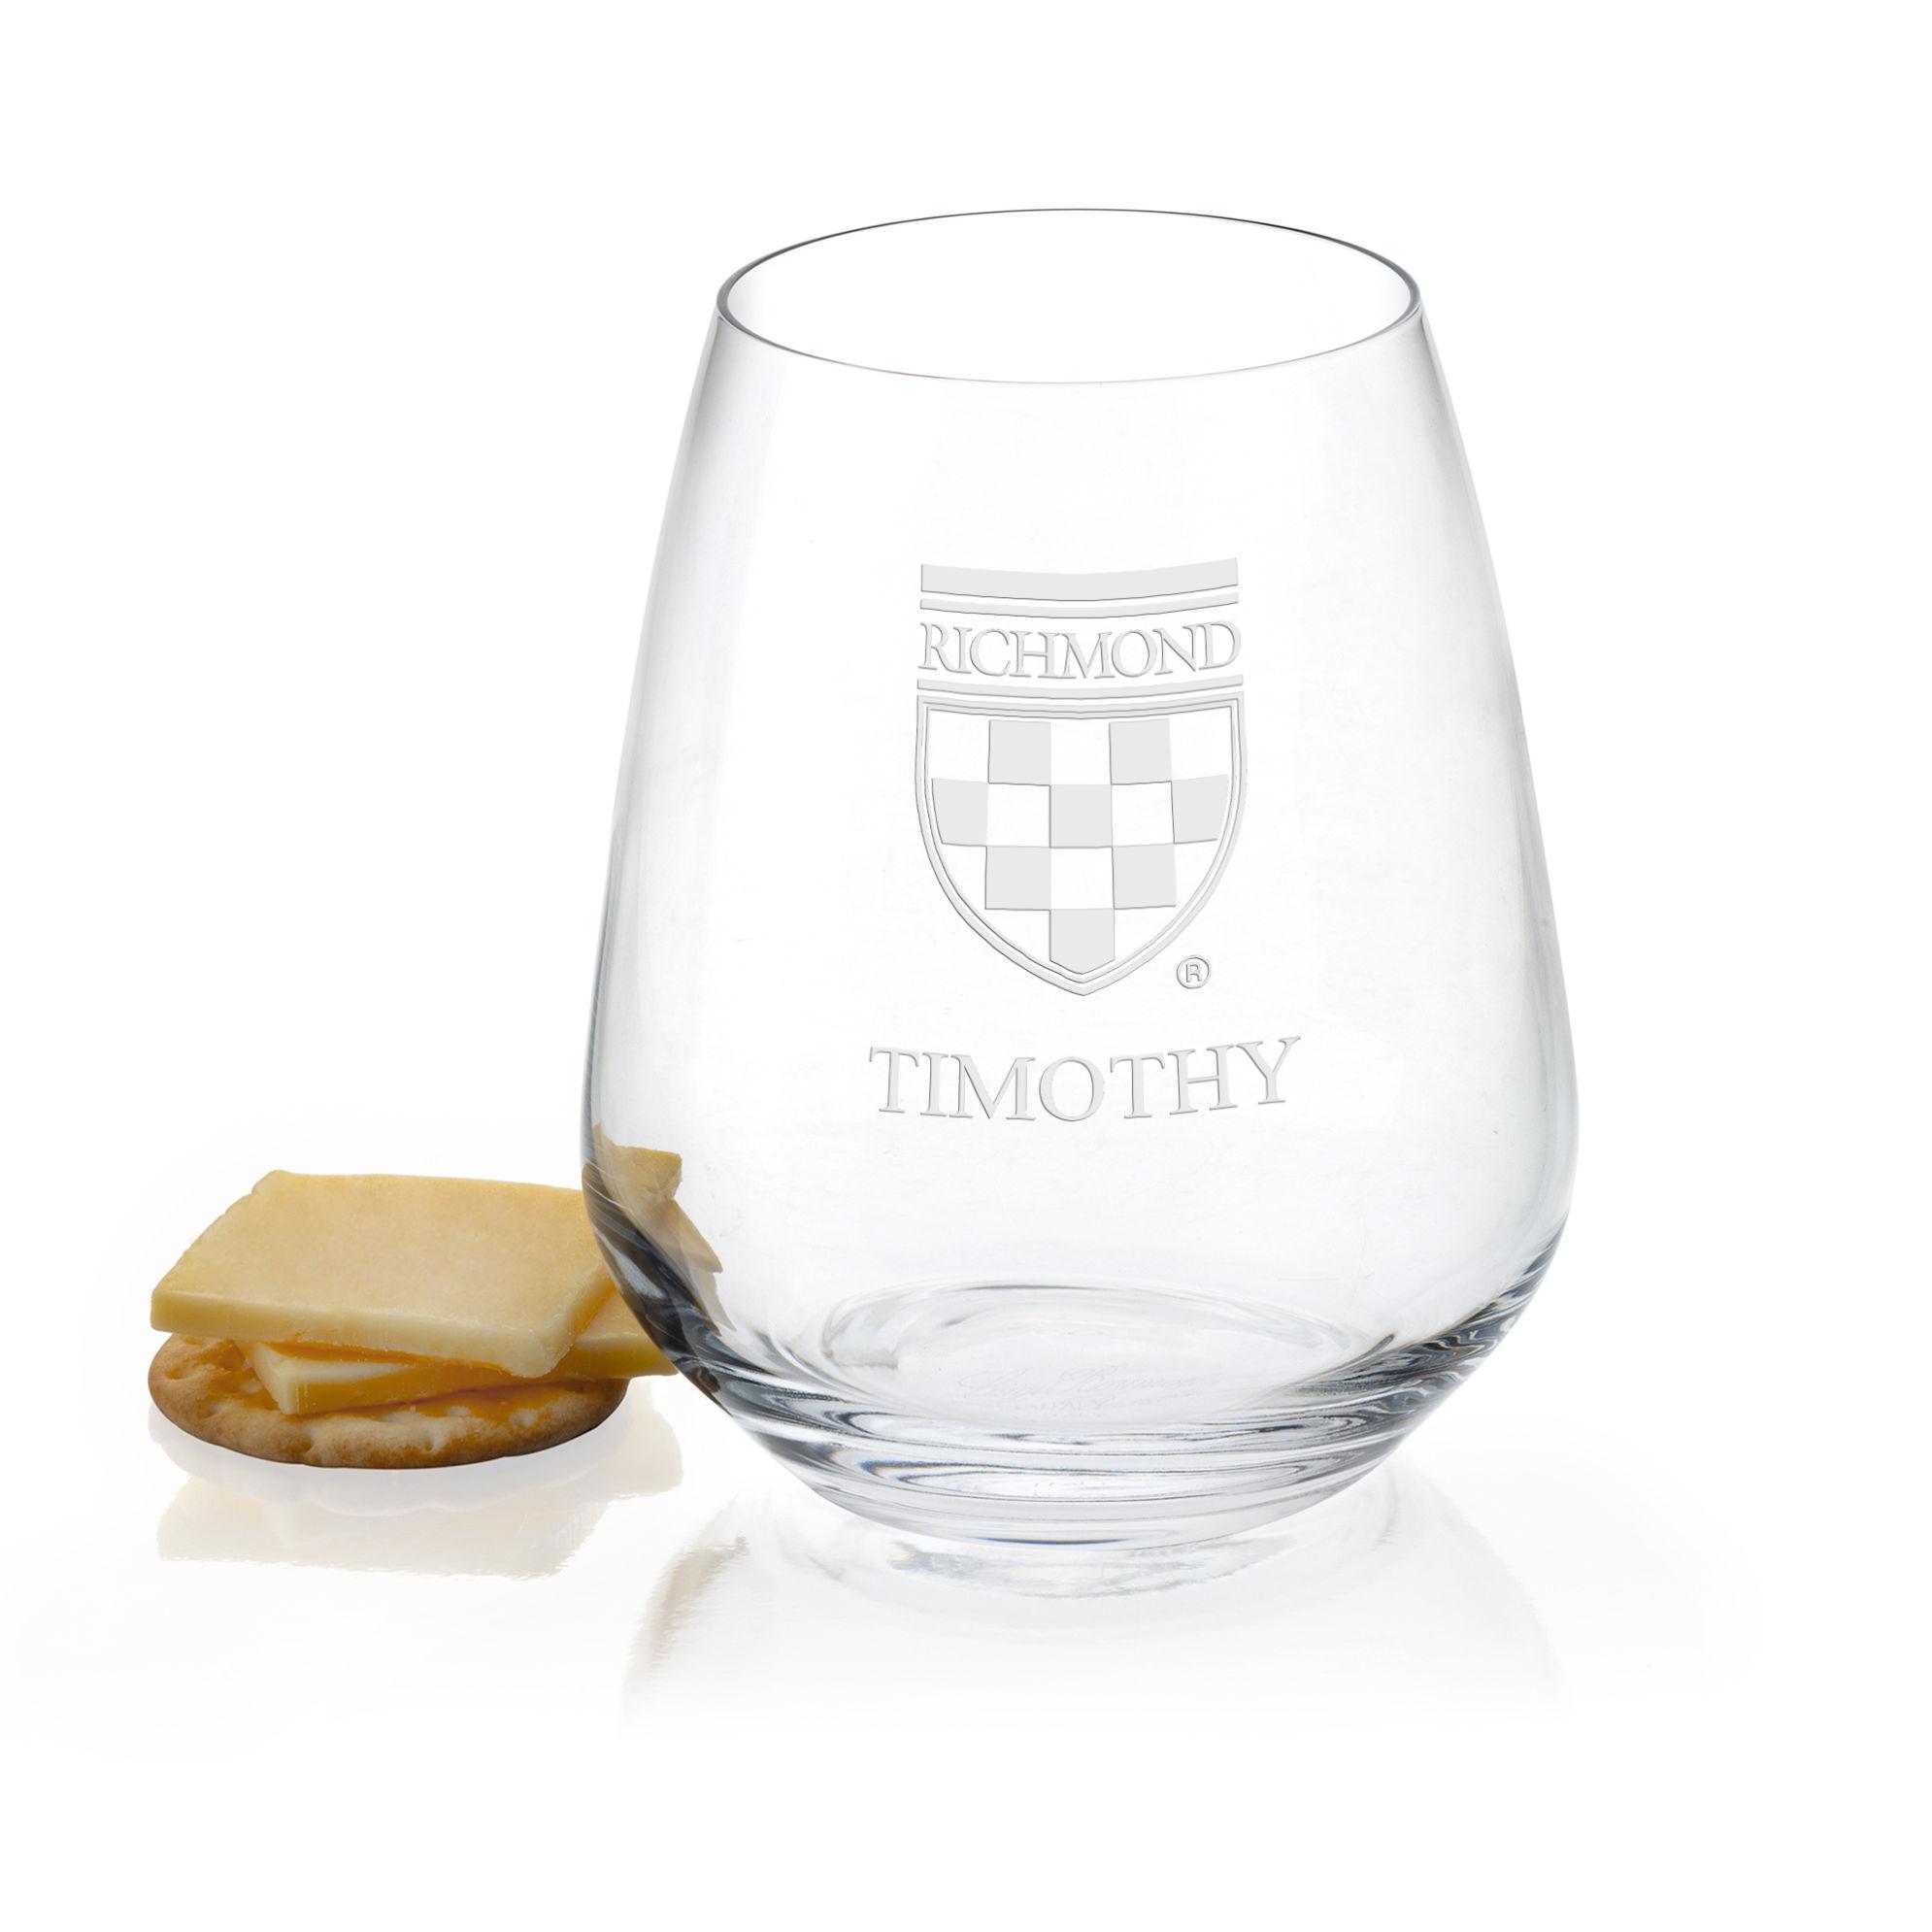 University of Richmond Stemless Wine Glasses - Set of 4